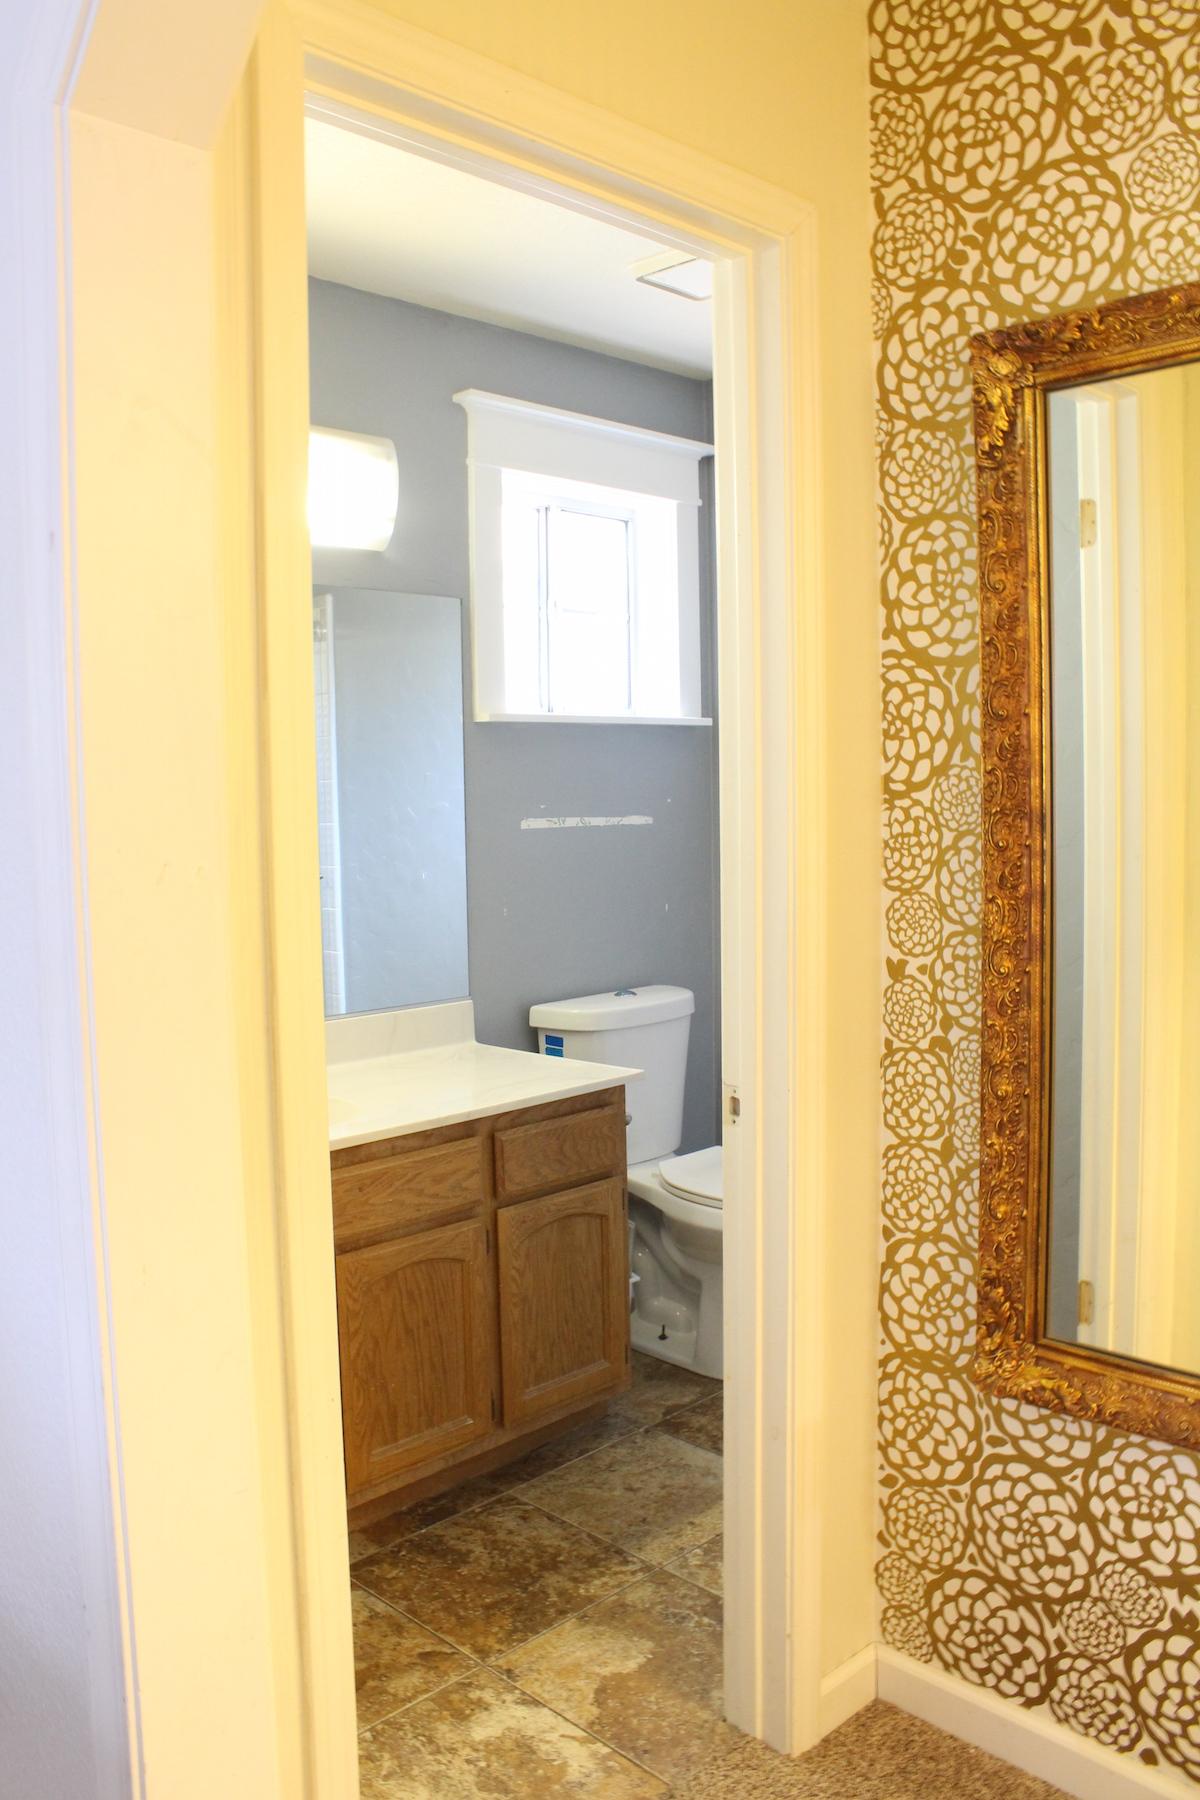 Prescott View Home Reno: Master Bathroom before - Classy Clutter